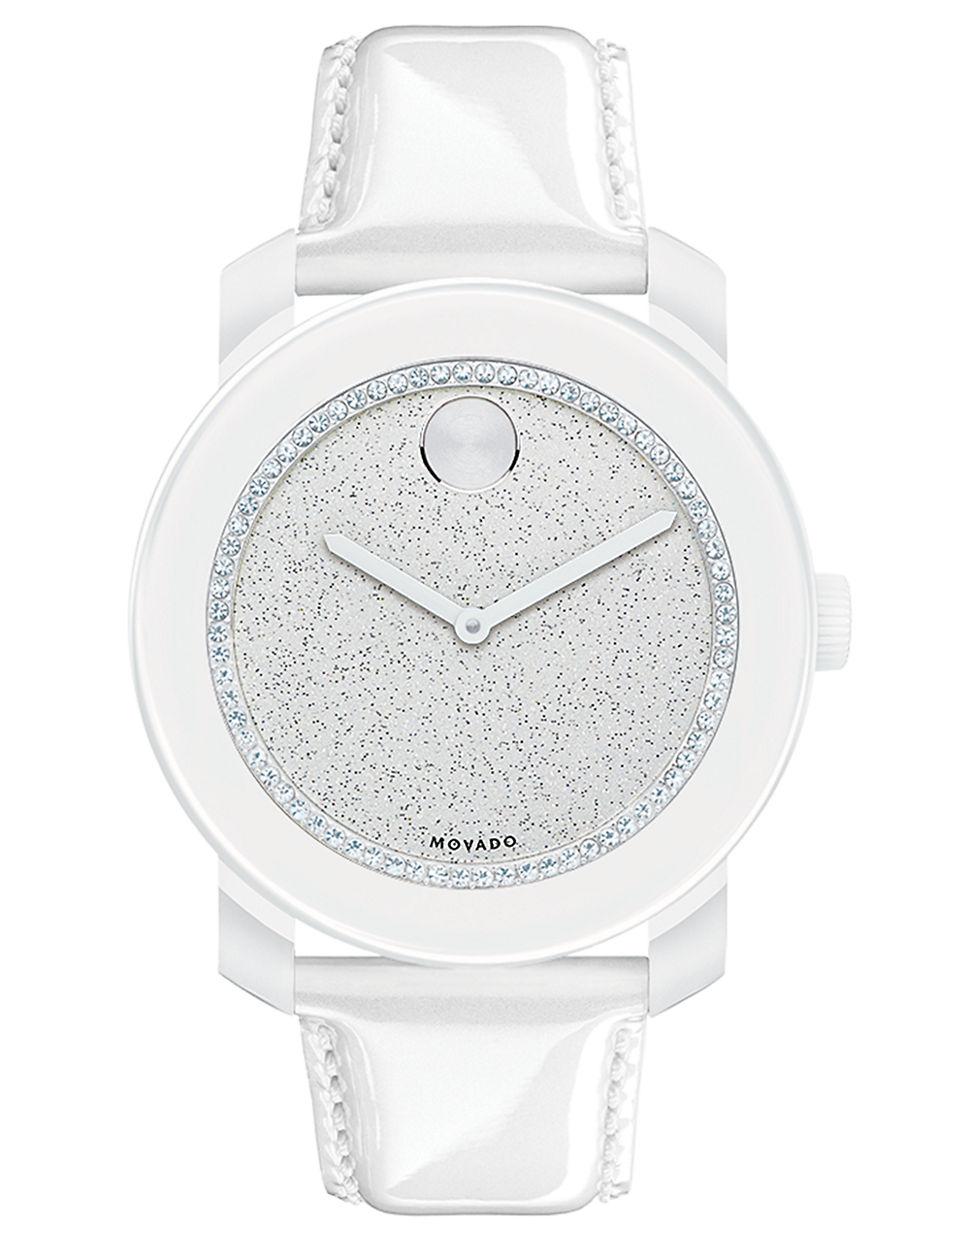 da59c960a Movado Bold Ladies Bold White Glitz Watch With Patent Leather Strap ...